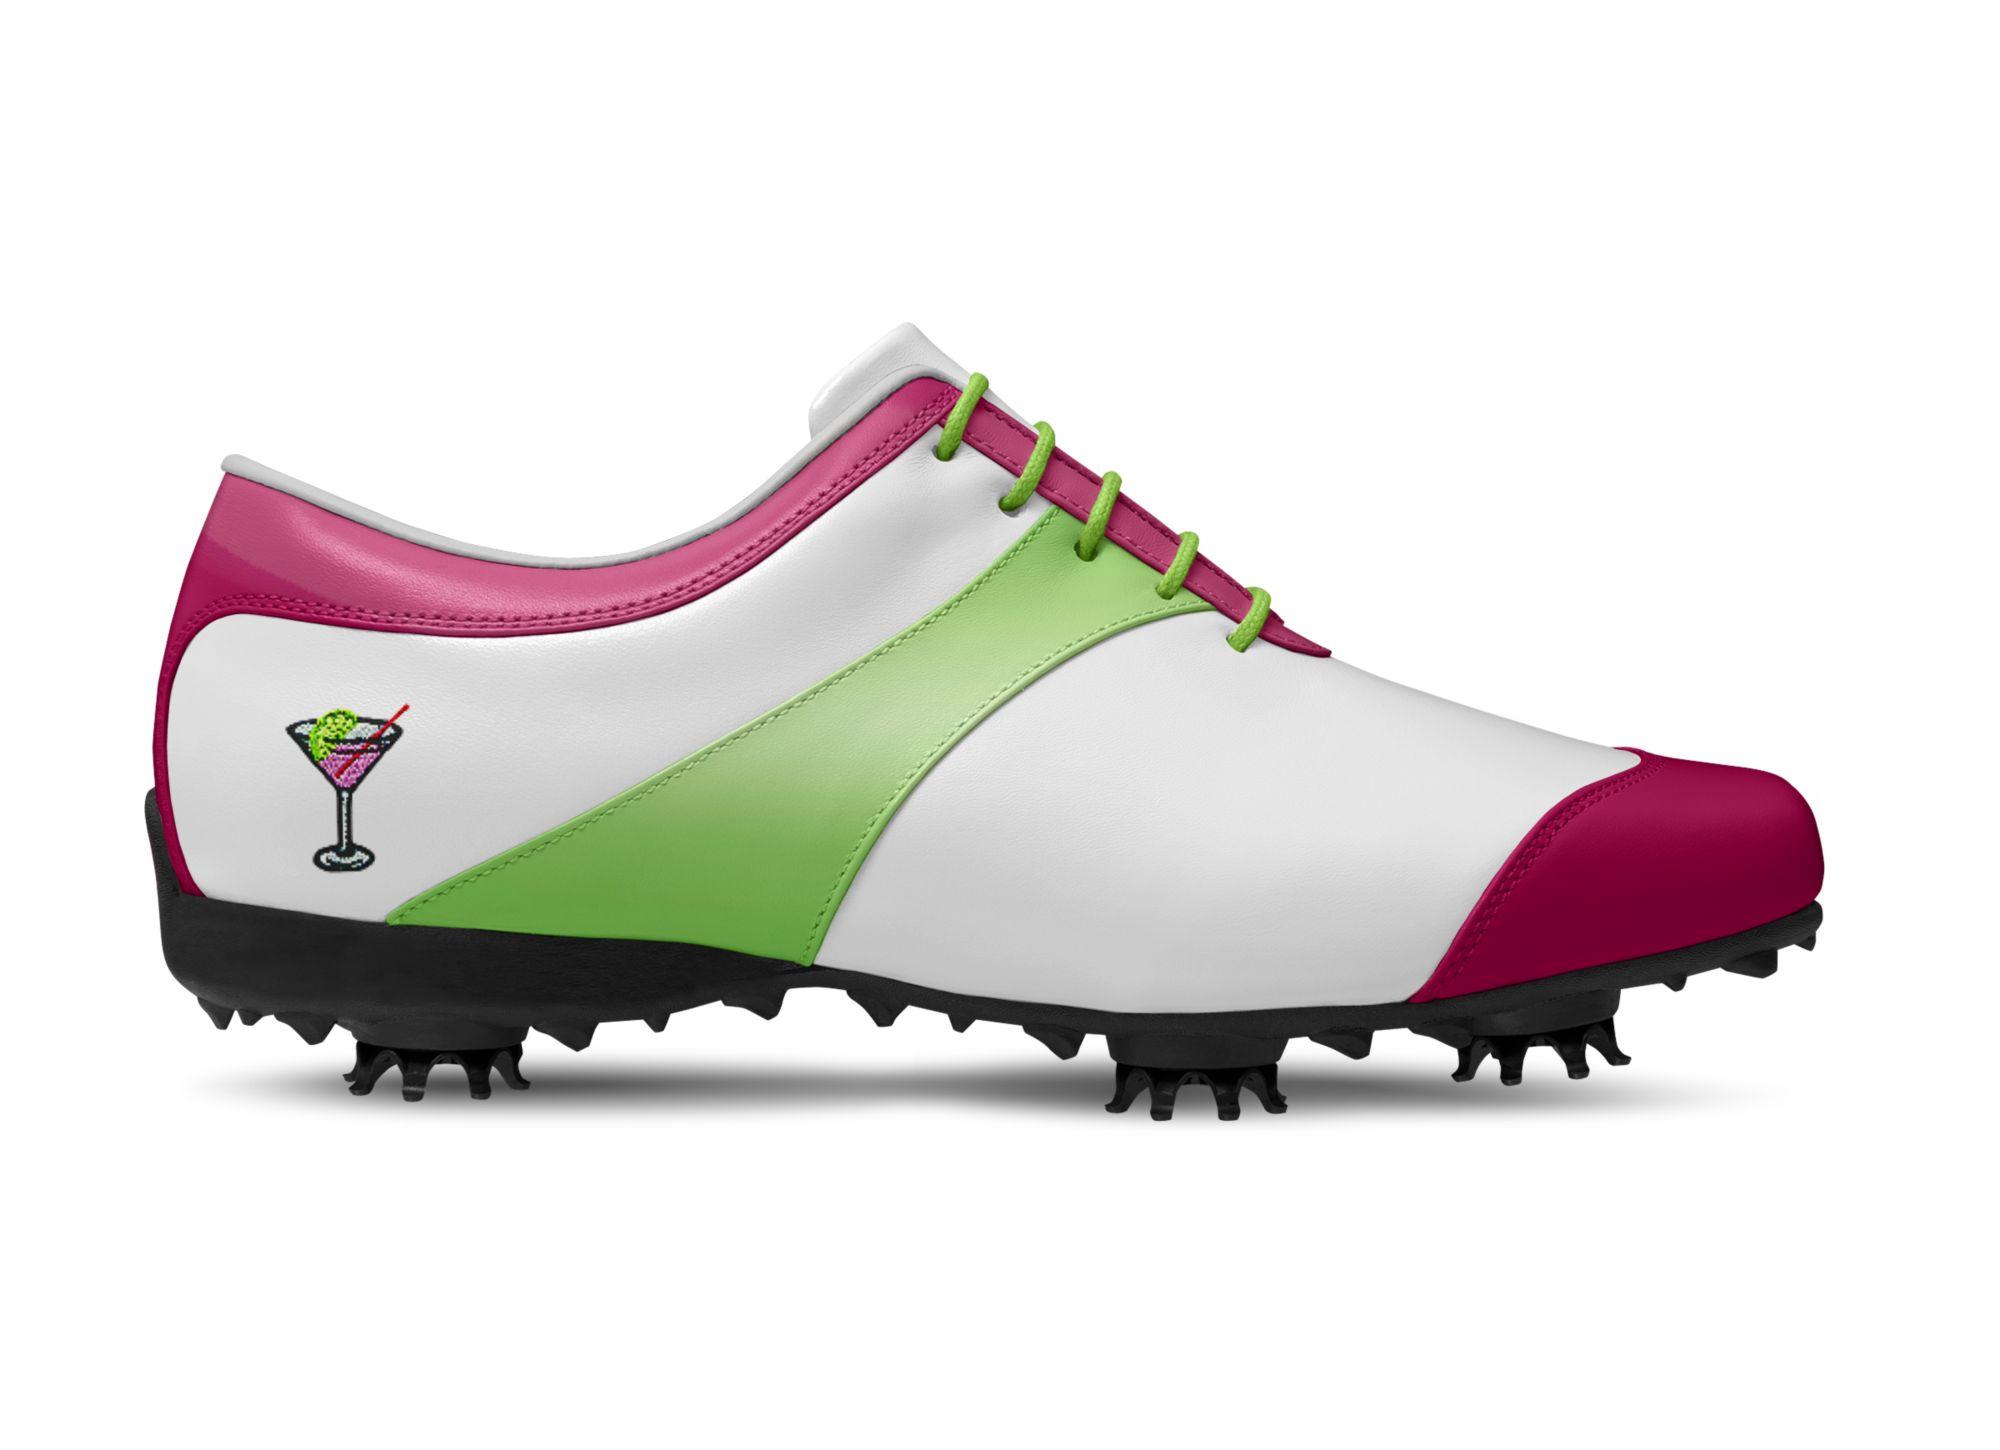 Footjoy Myjoy Golf Shoes For Women